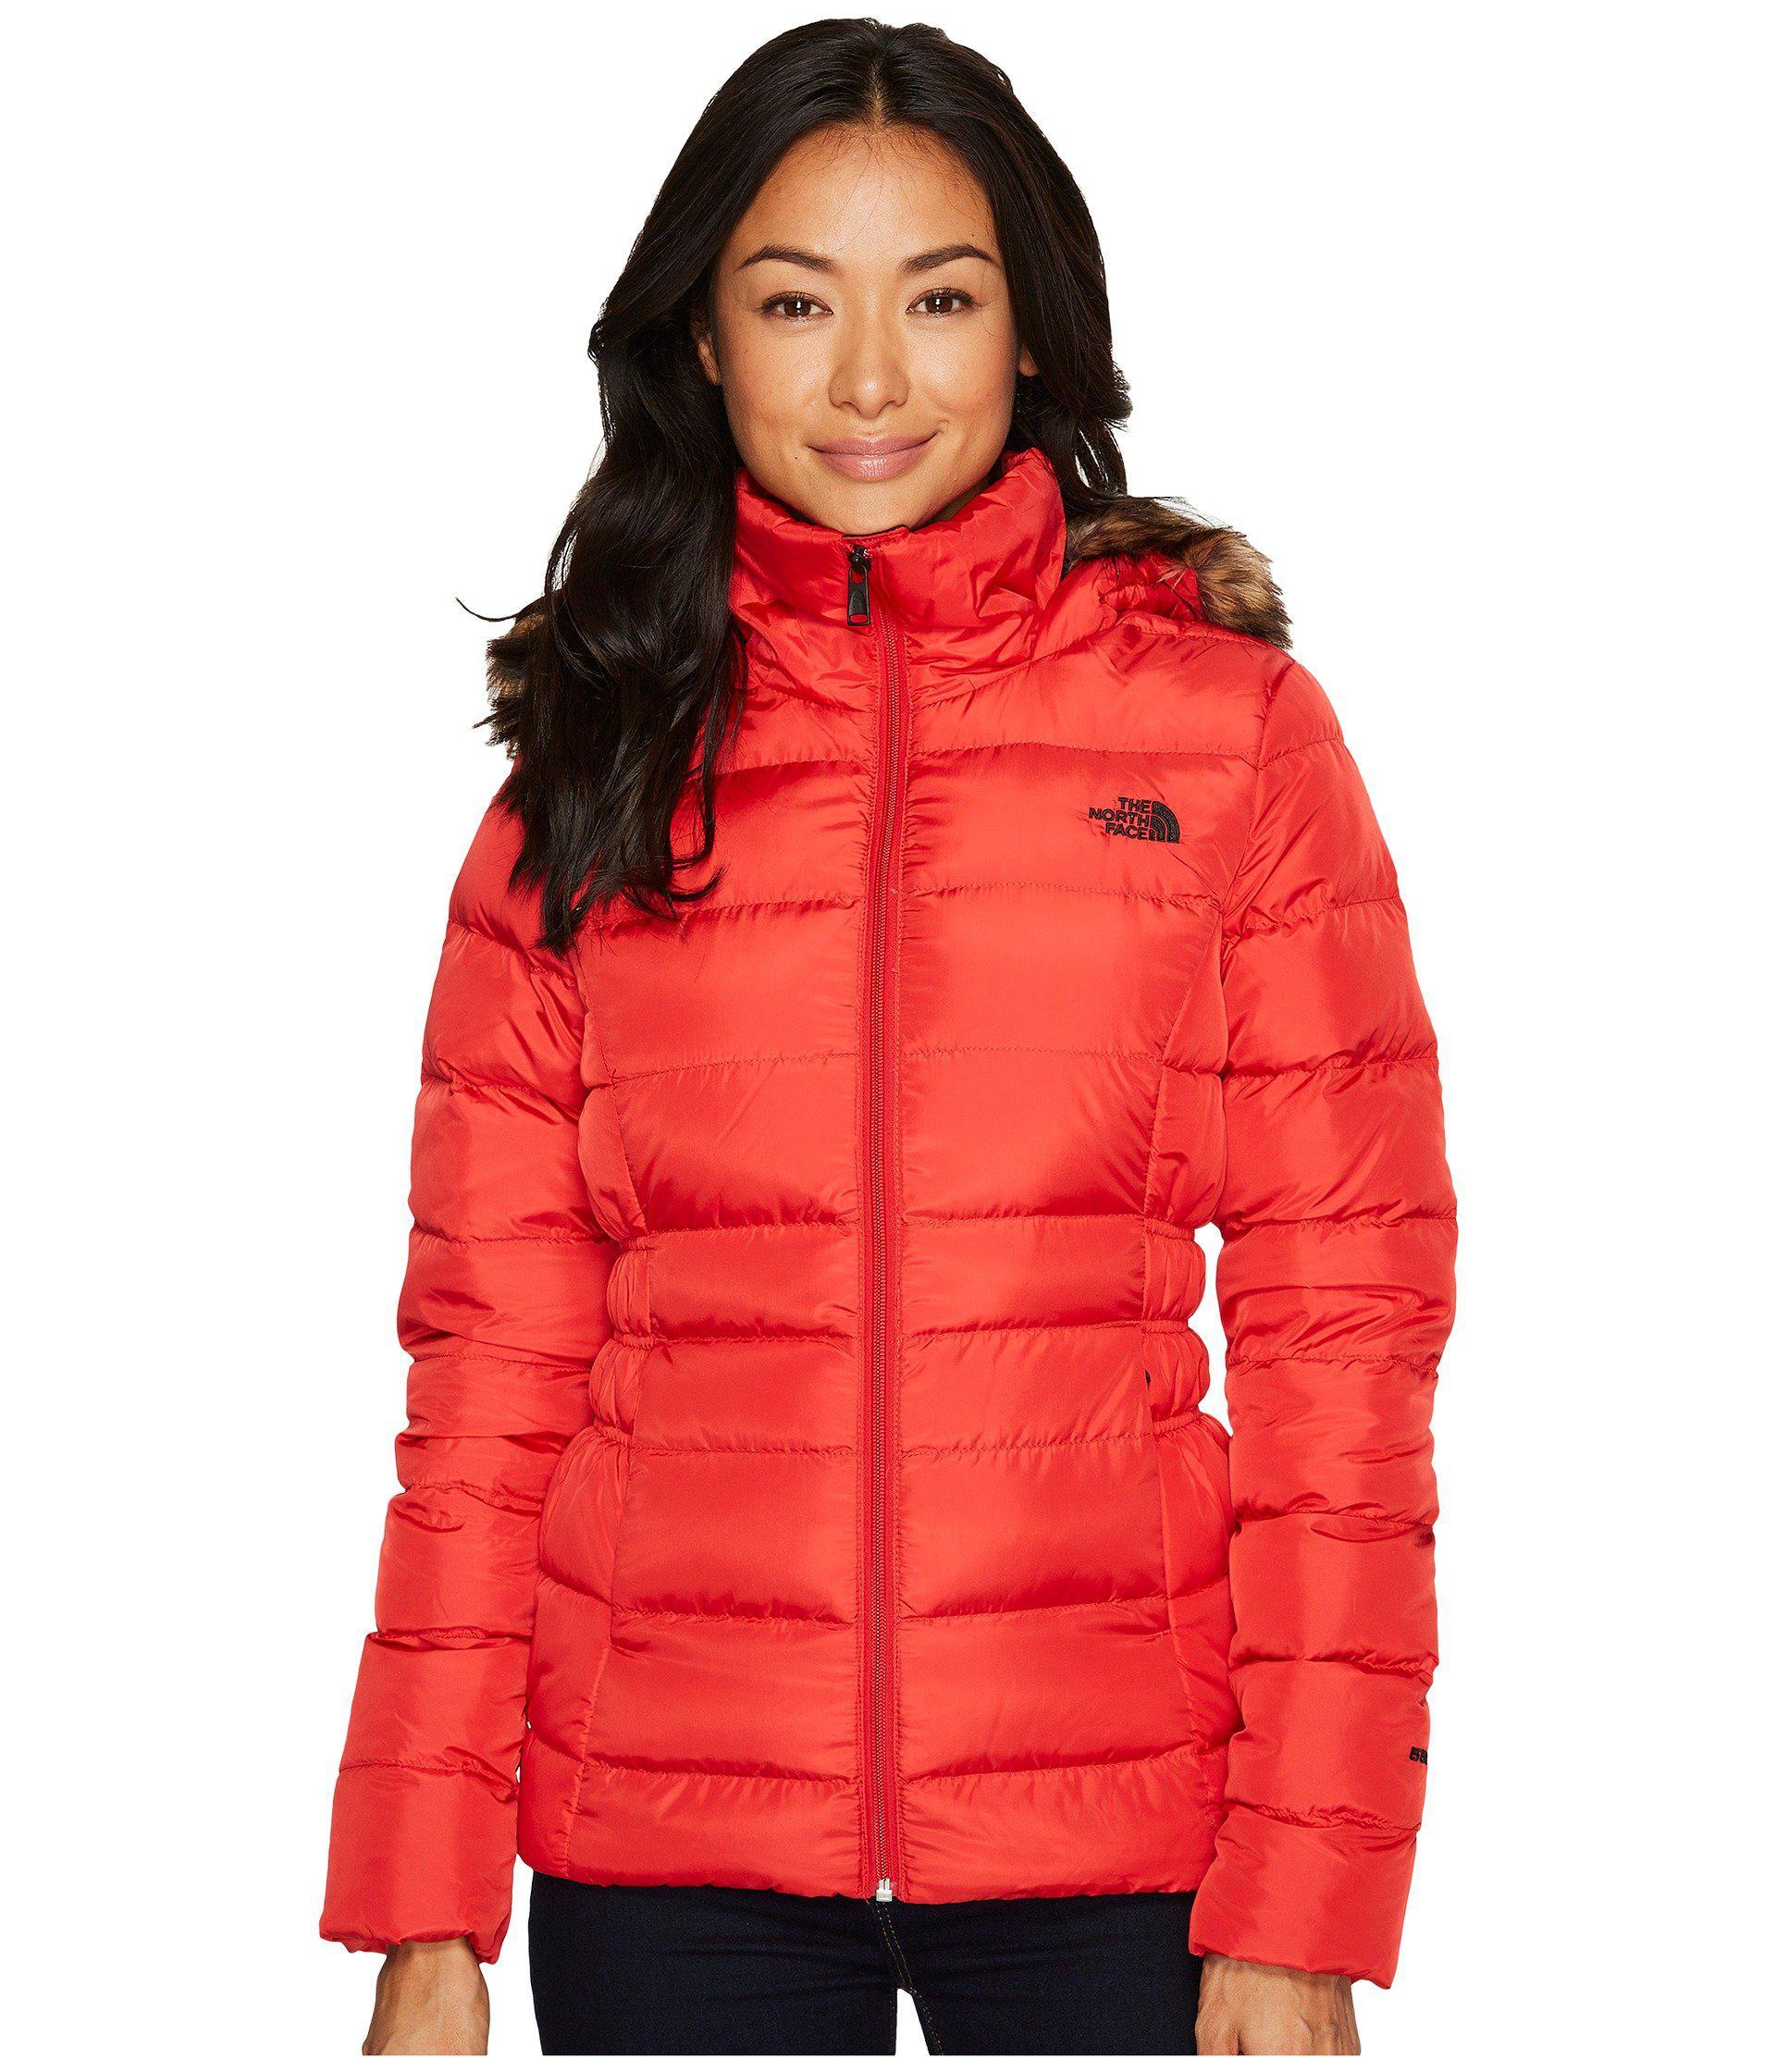 e04e43ea0c Lyst - The North Face Gotham Jacket Ii (metallic Copper) Women s ...